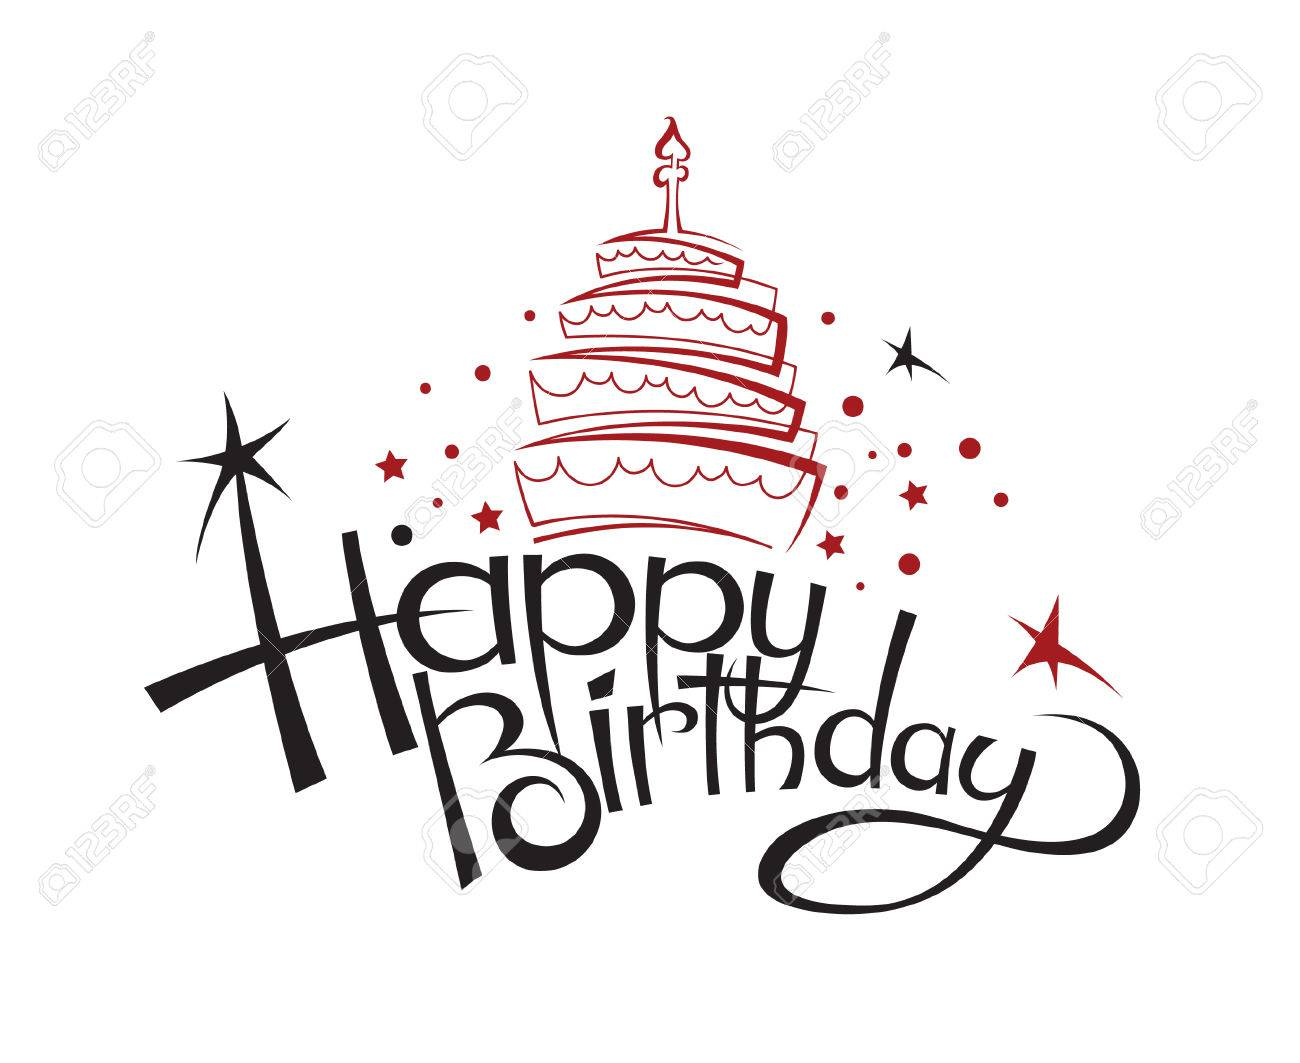 Happy Birthday Design Clipart.